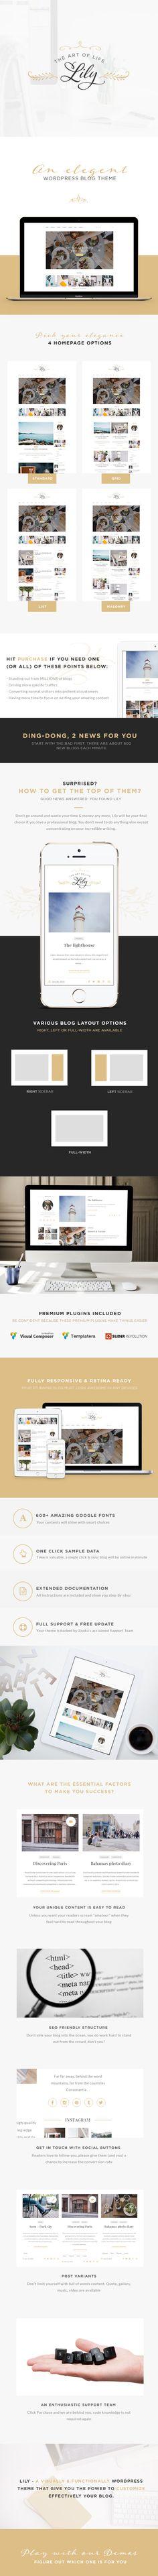 Lily - An Elegant WordPress Blog Theme  http://demo.thememove.com/?item=lily